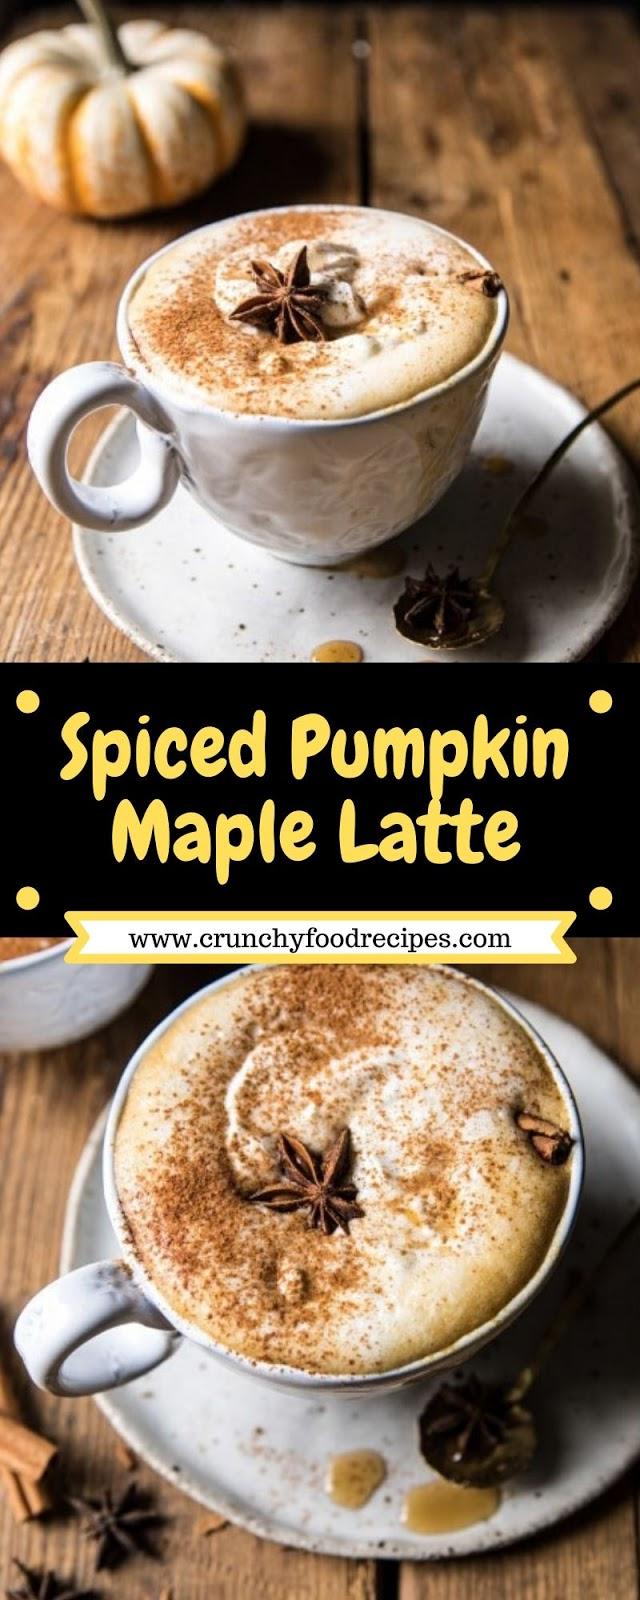 Spiced Pumpkin Maple Latte